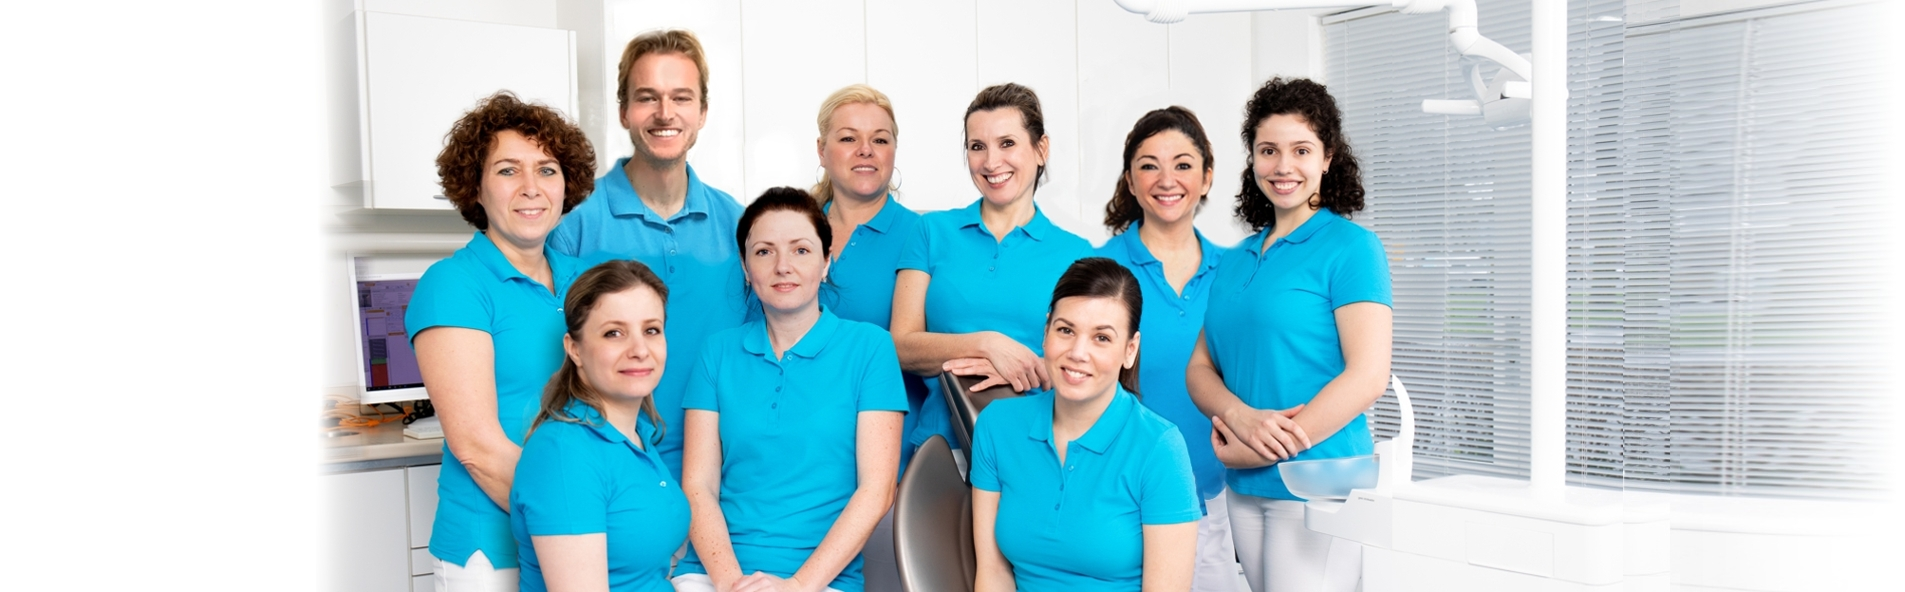 tandarts-almere-groepsfoto